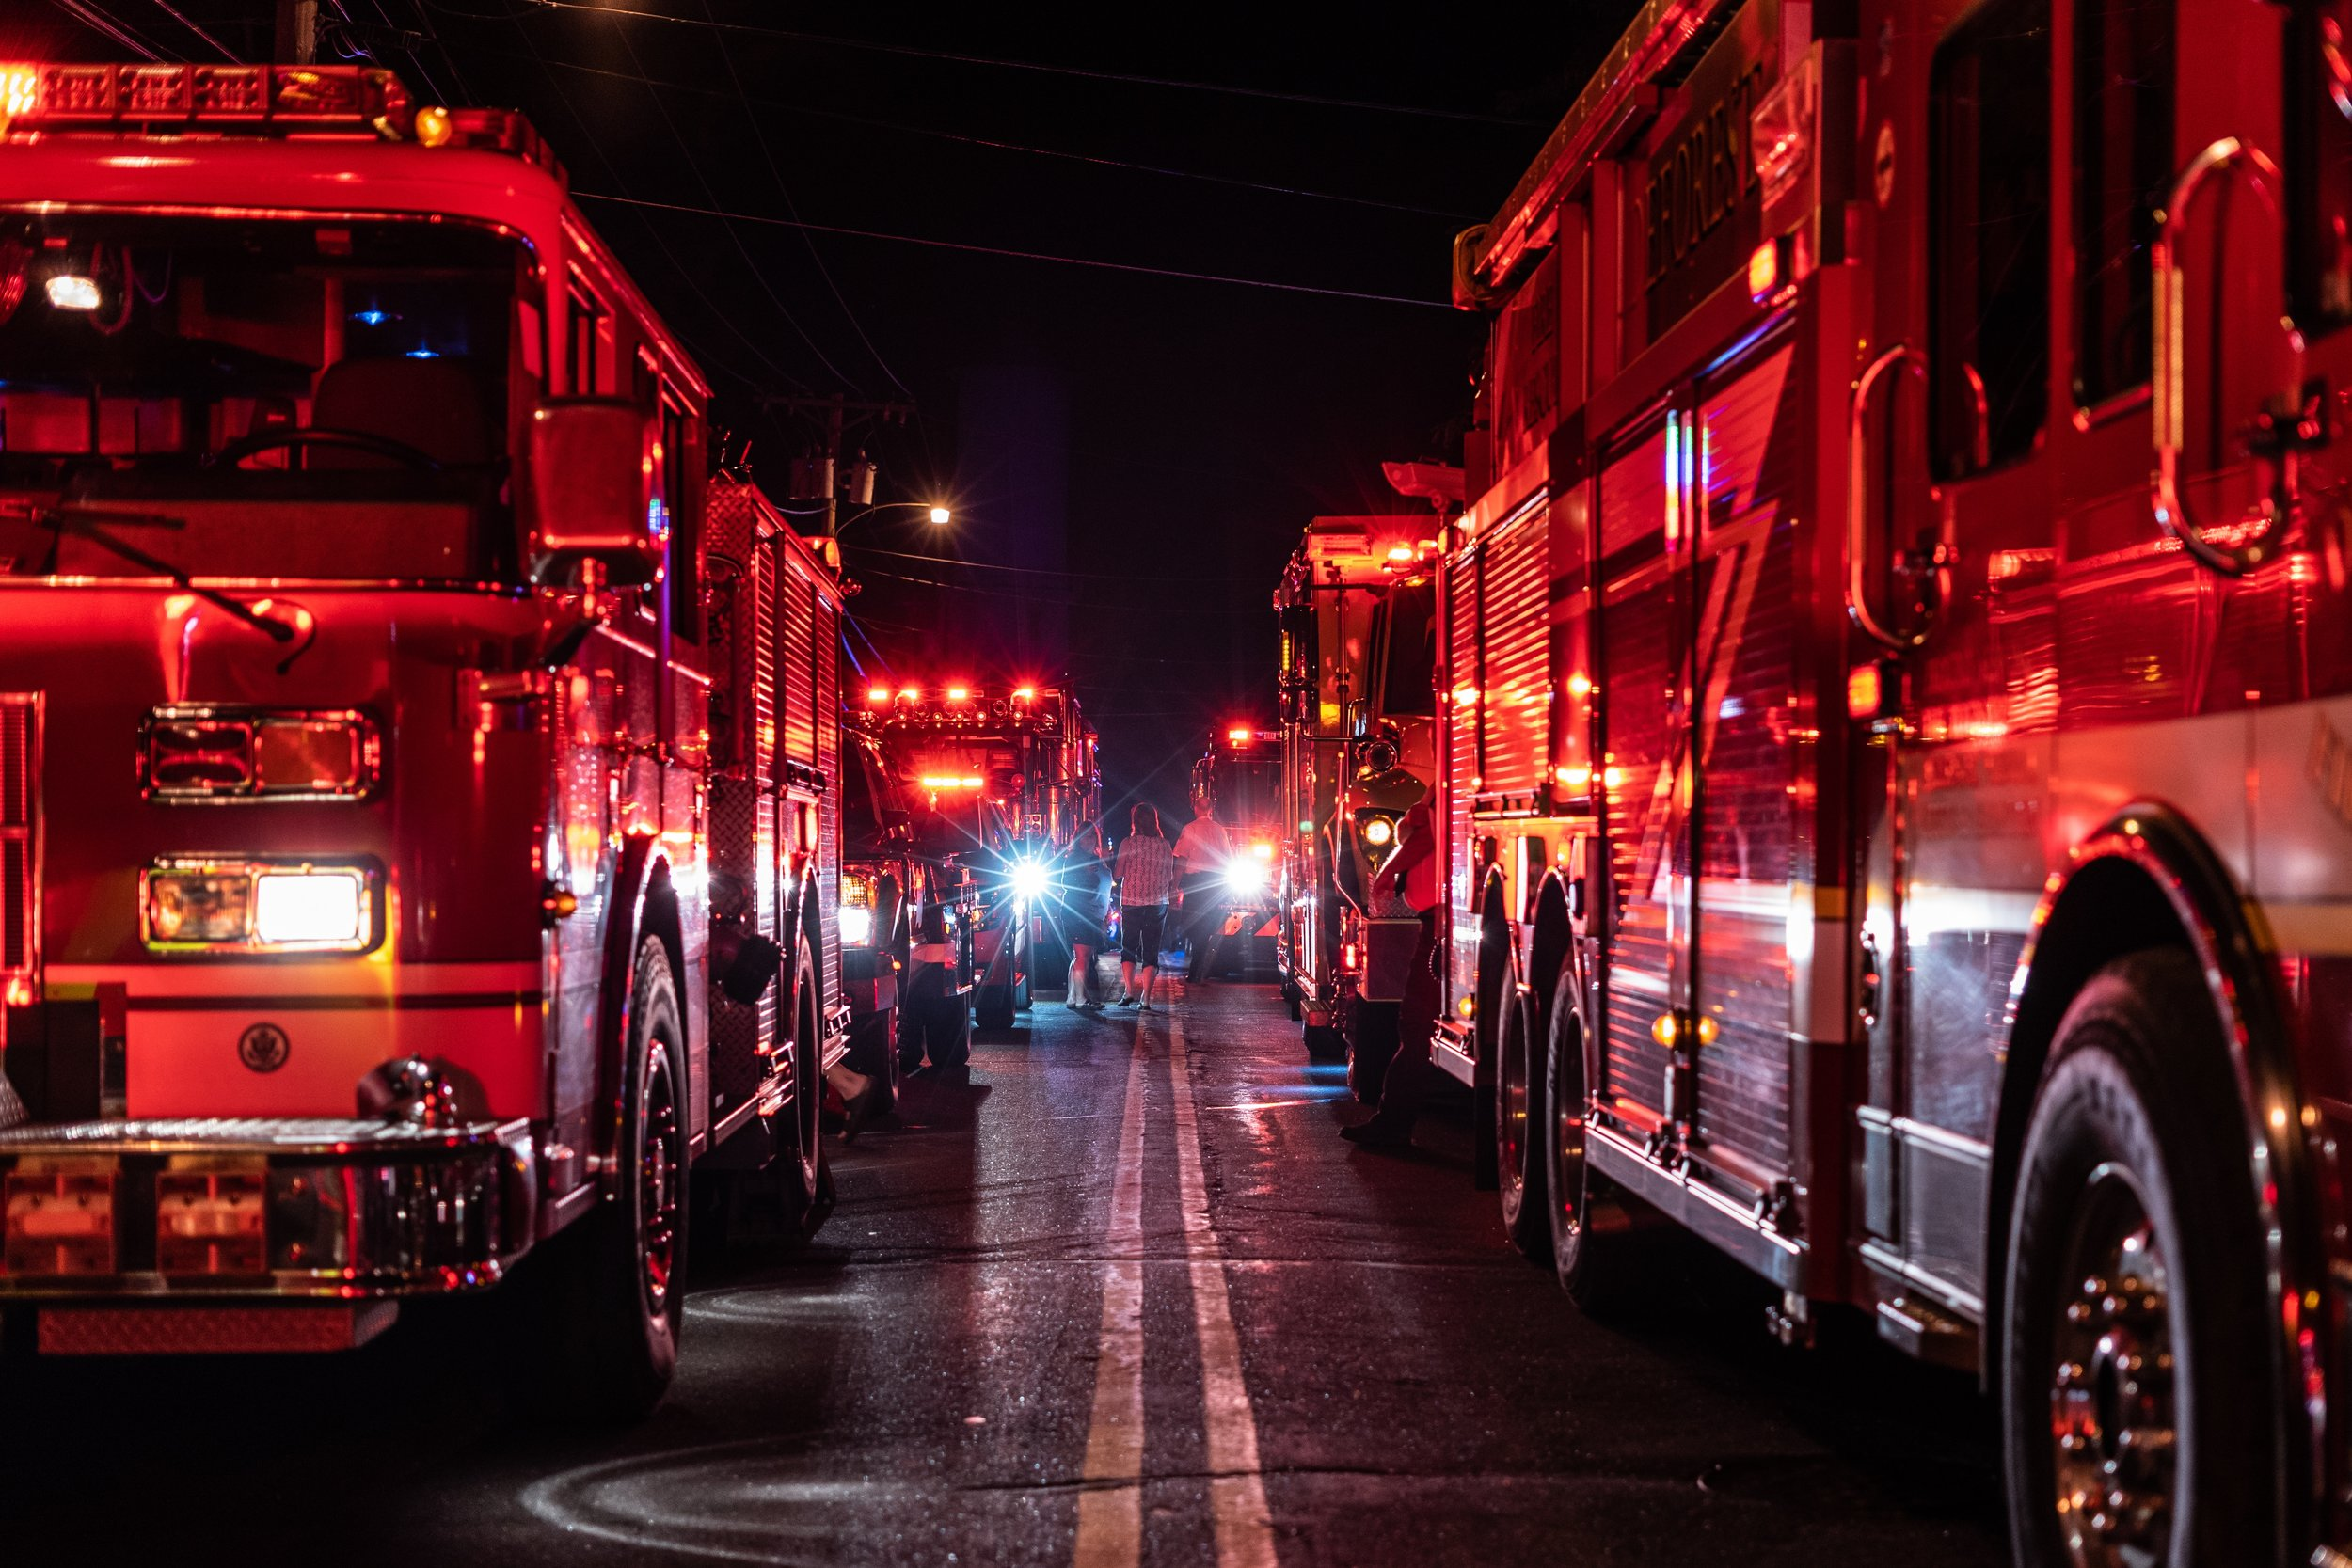 Firetrucks. Photo by Connor Betts courtesy of Unsplash